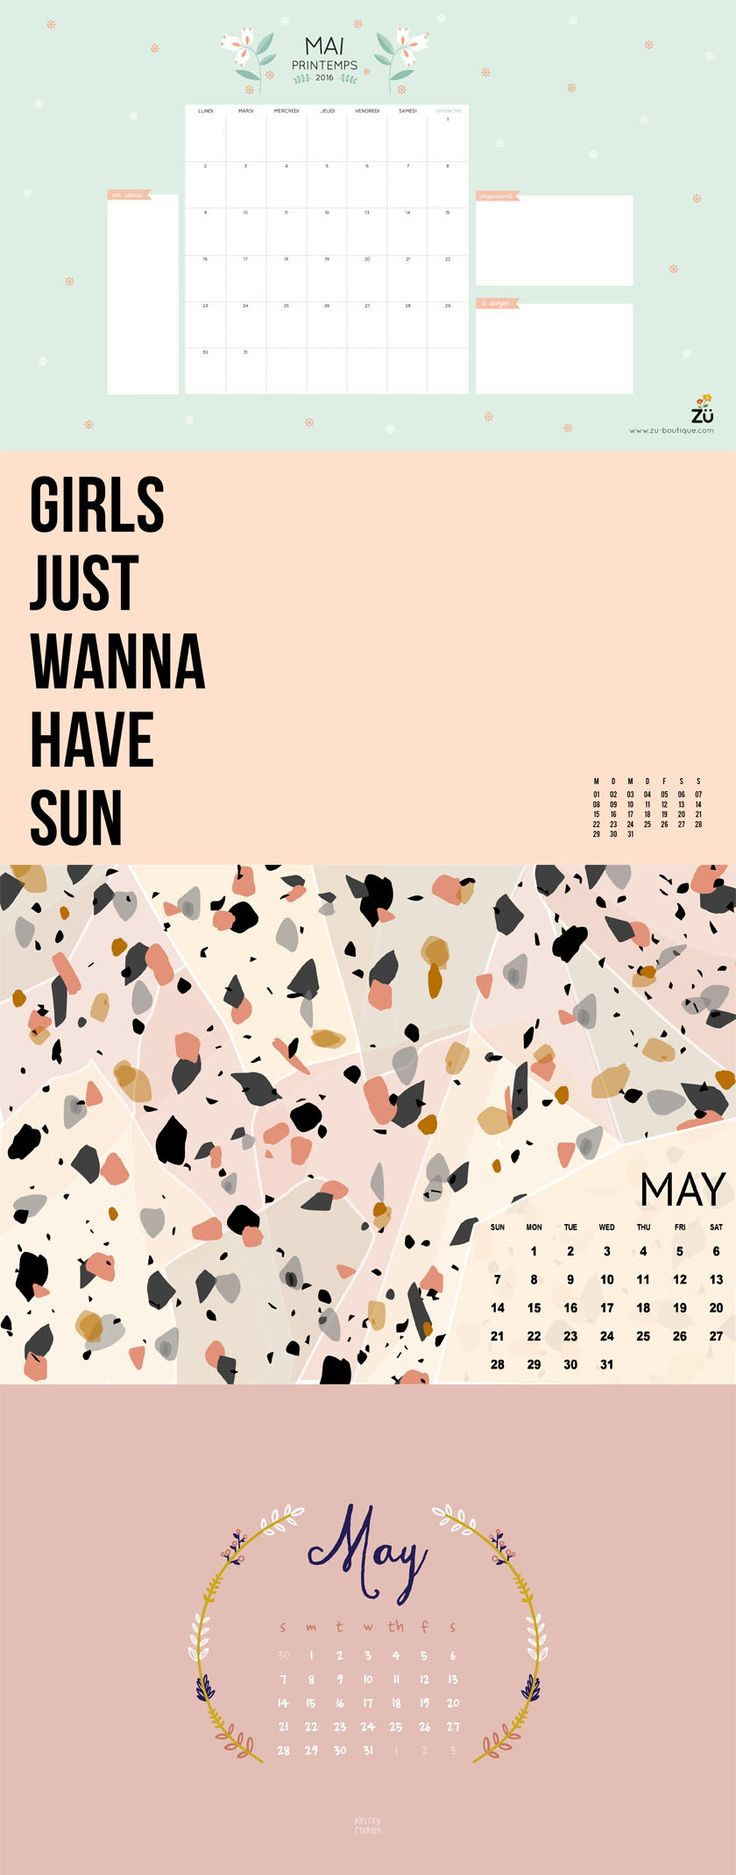 Free Desktop Wallpaper Collection Mai 2017